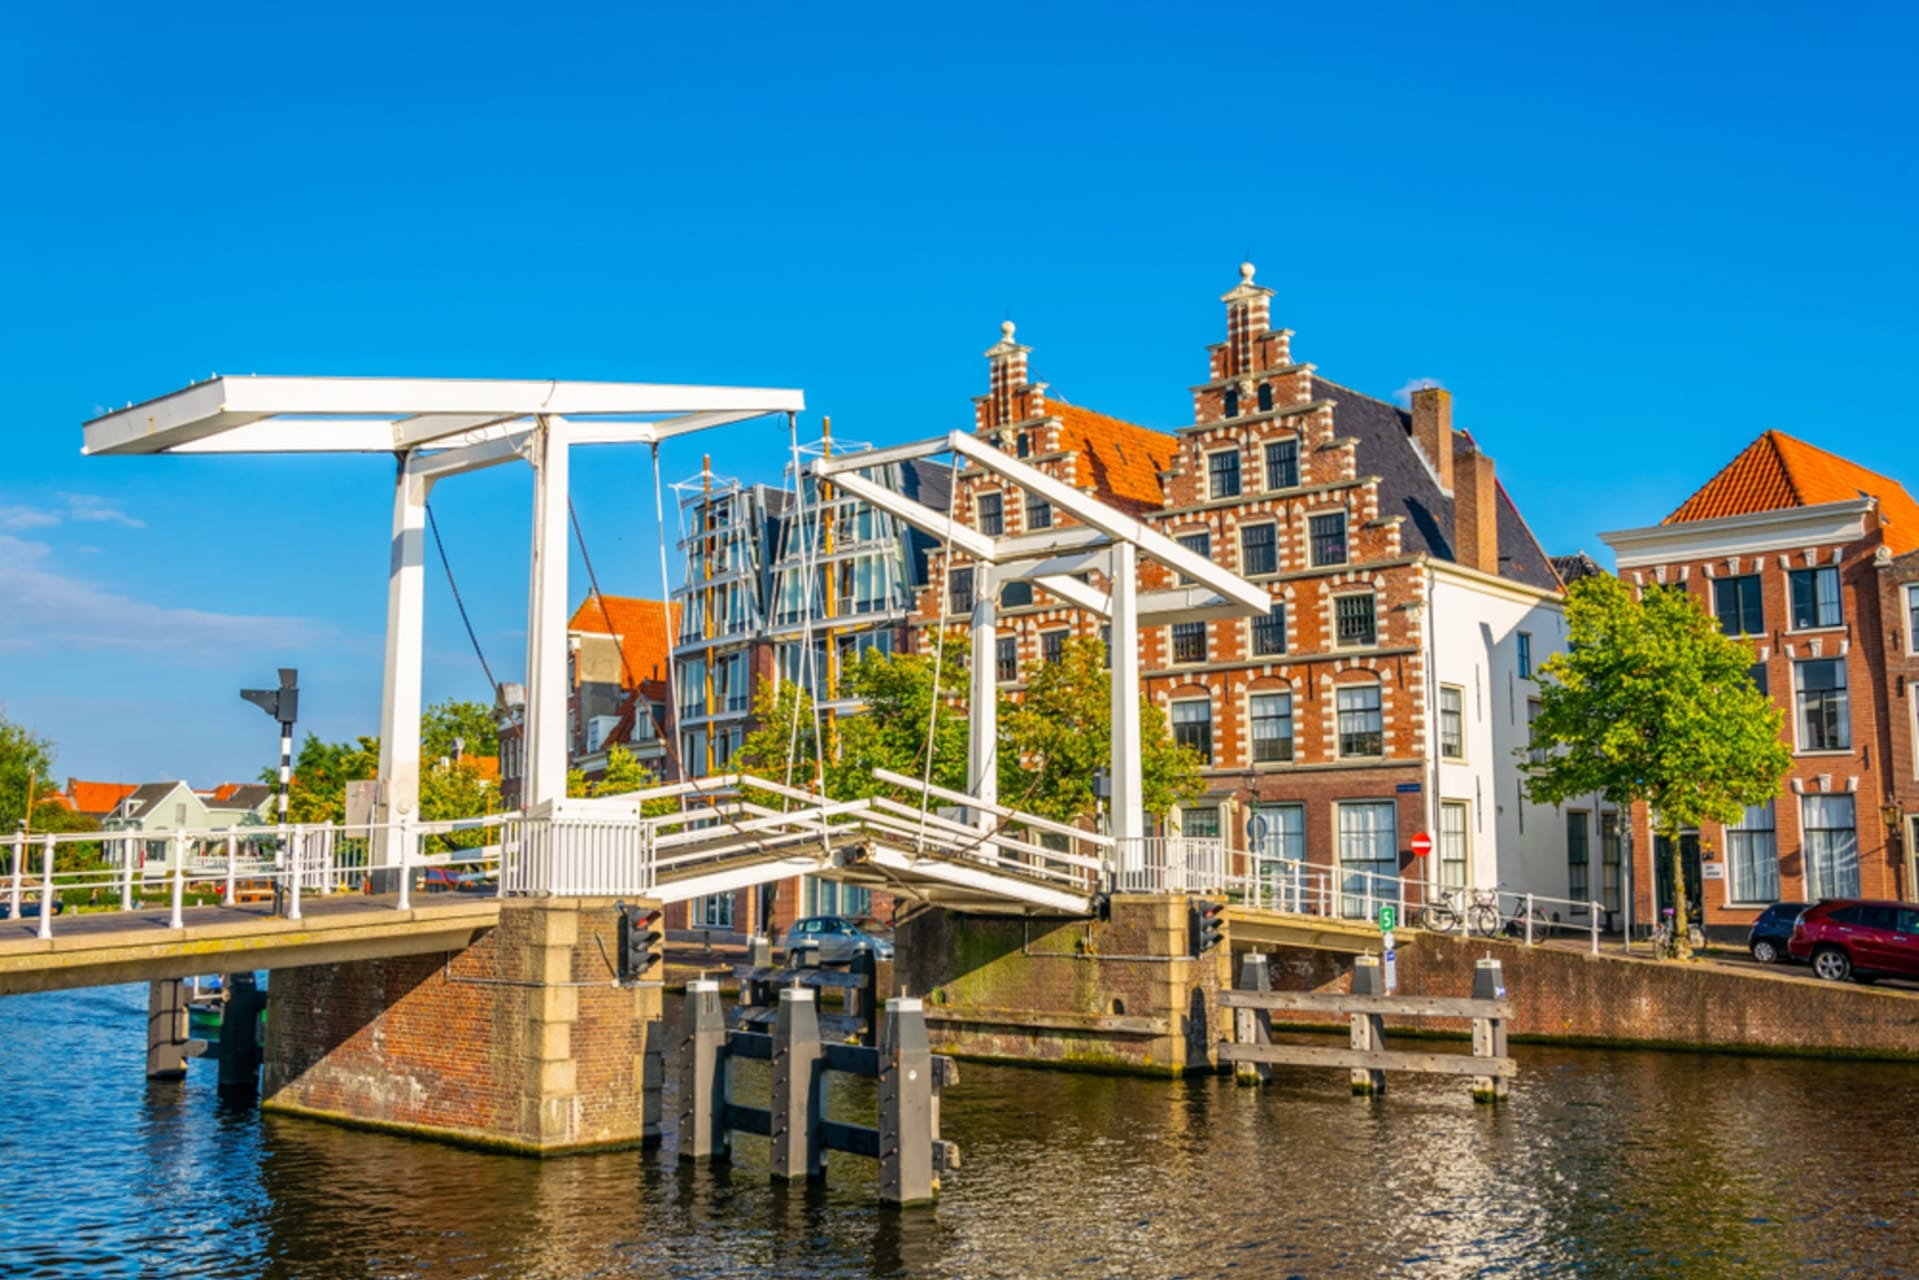 Haarlem - Haarlem by Bike - Hit the Highlights